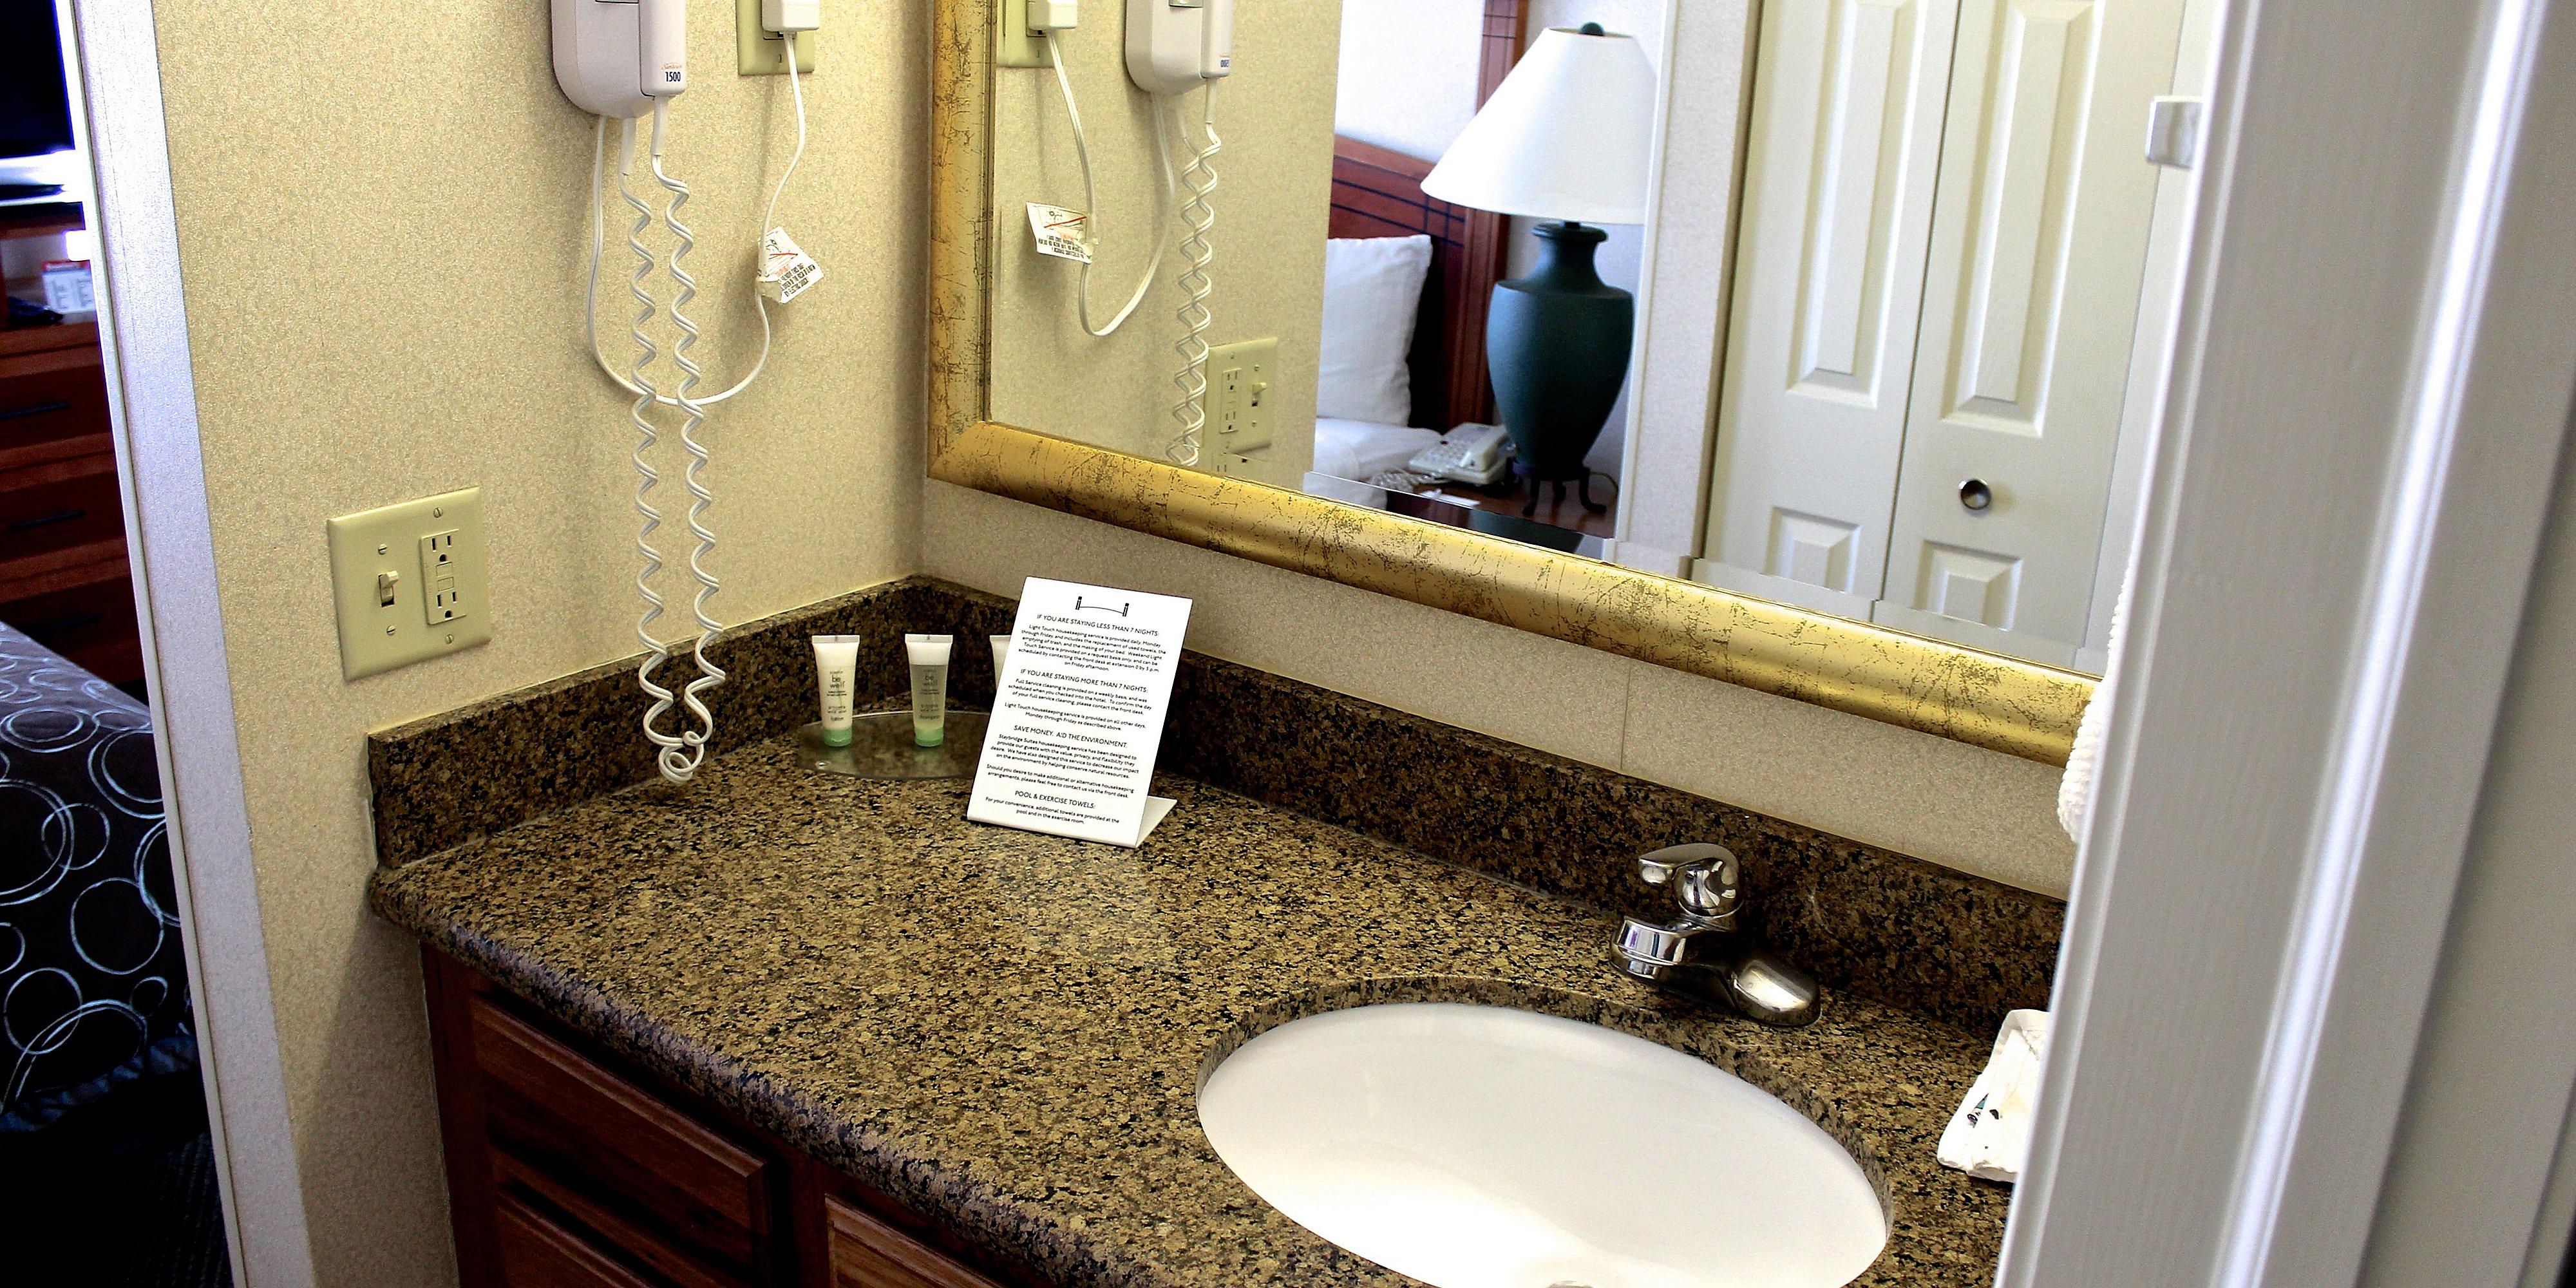 Staybridge Suites Grand Rapids Hotels | Staybridge Suites